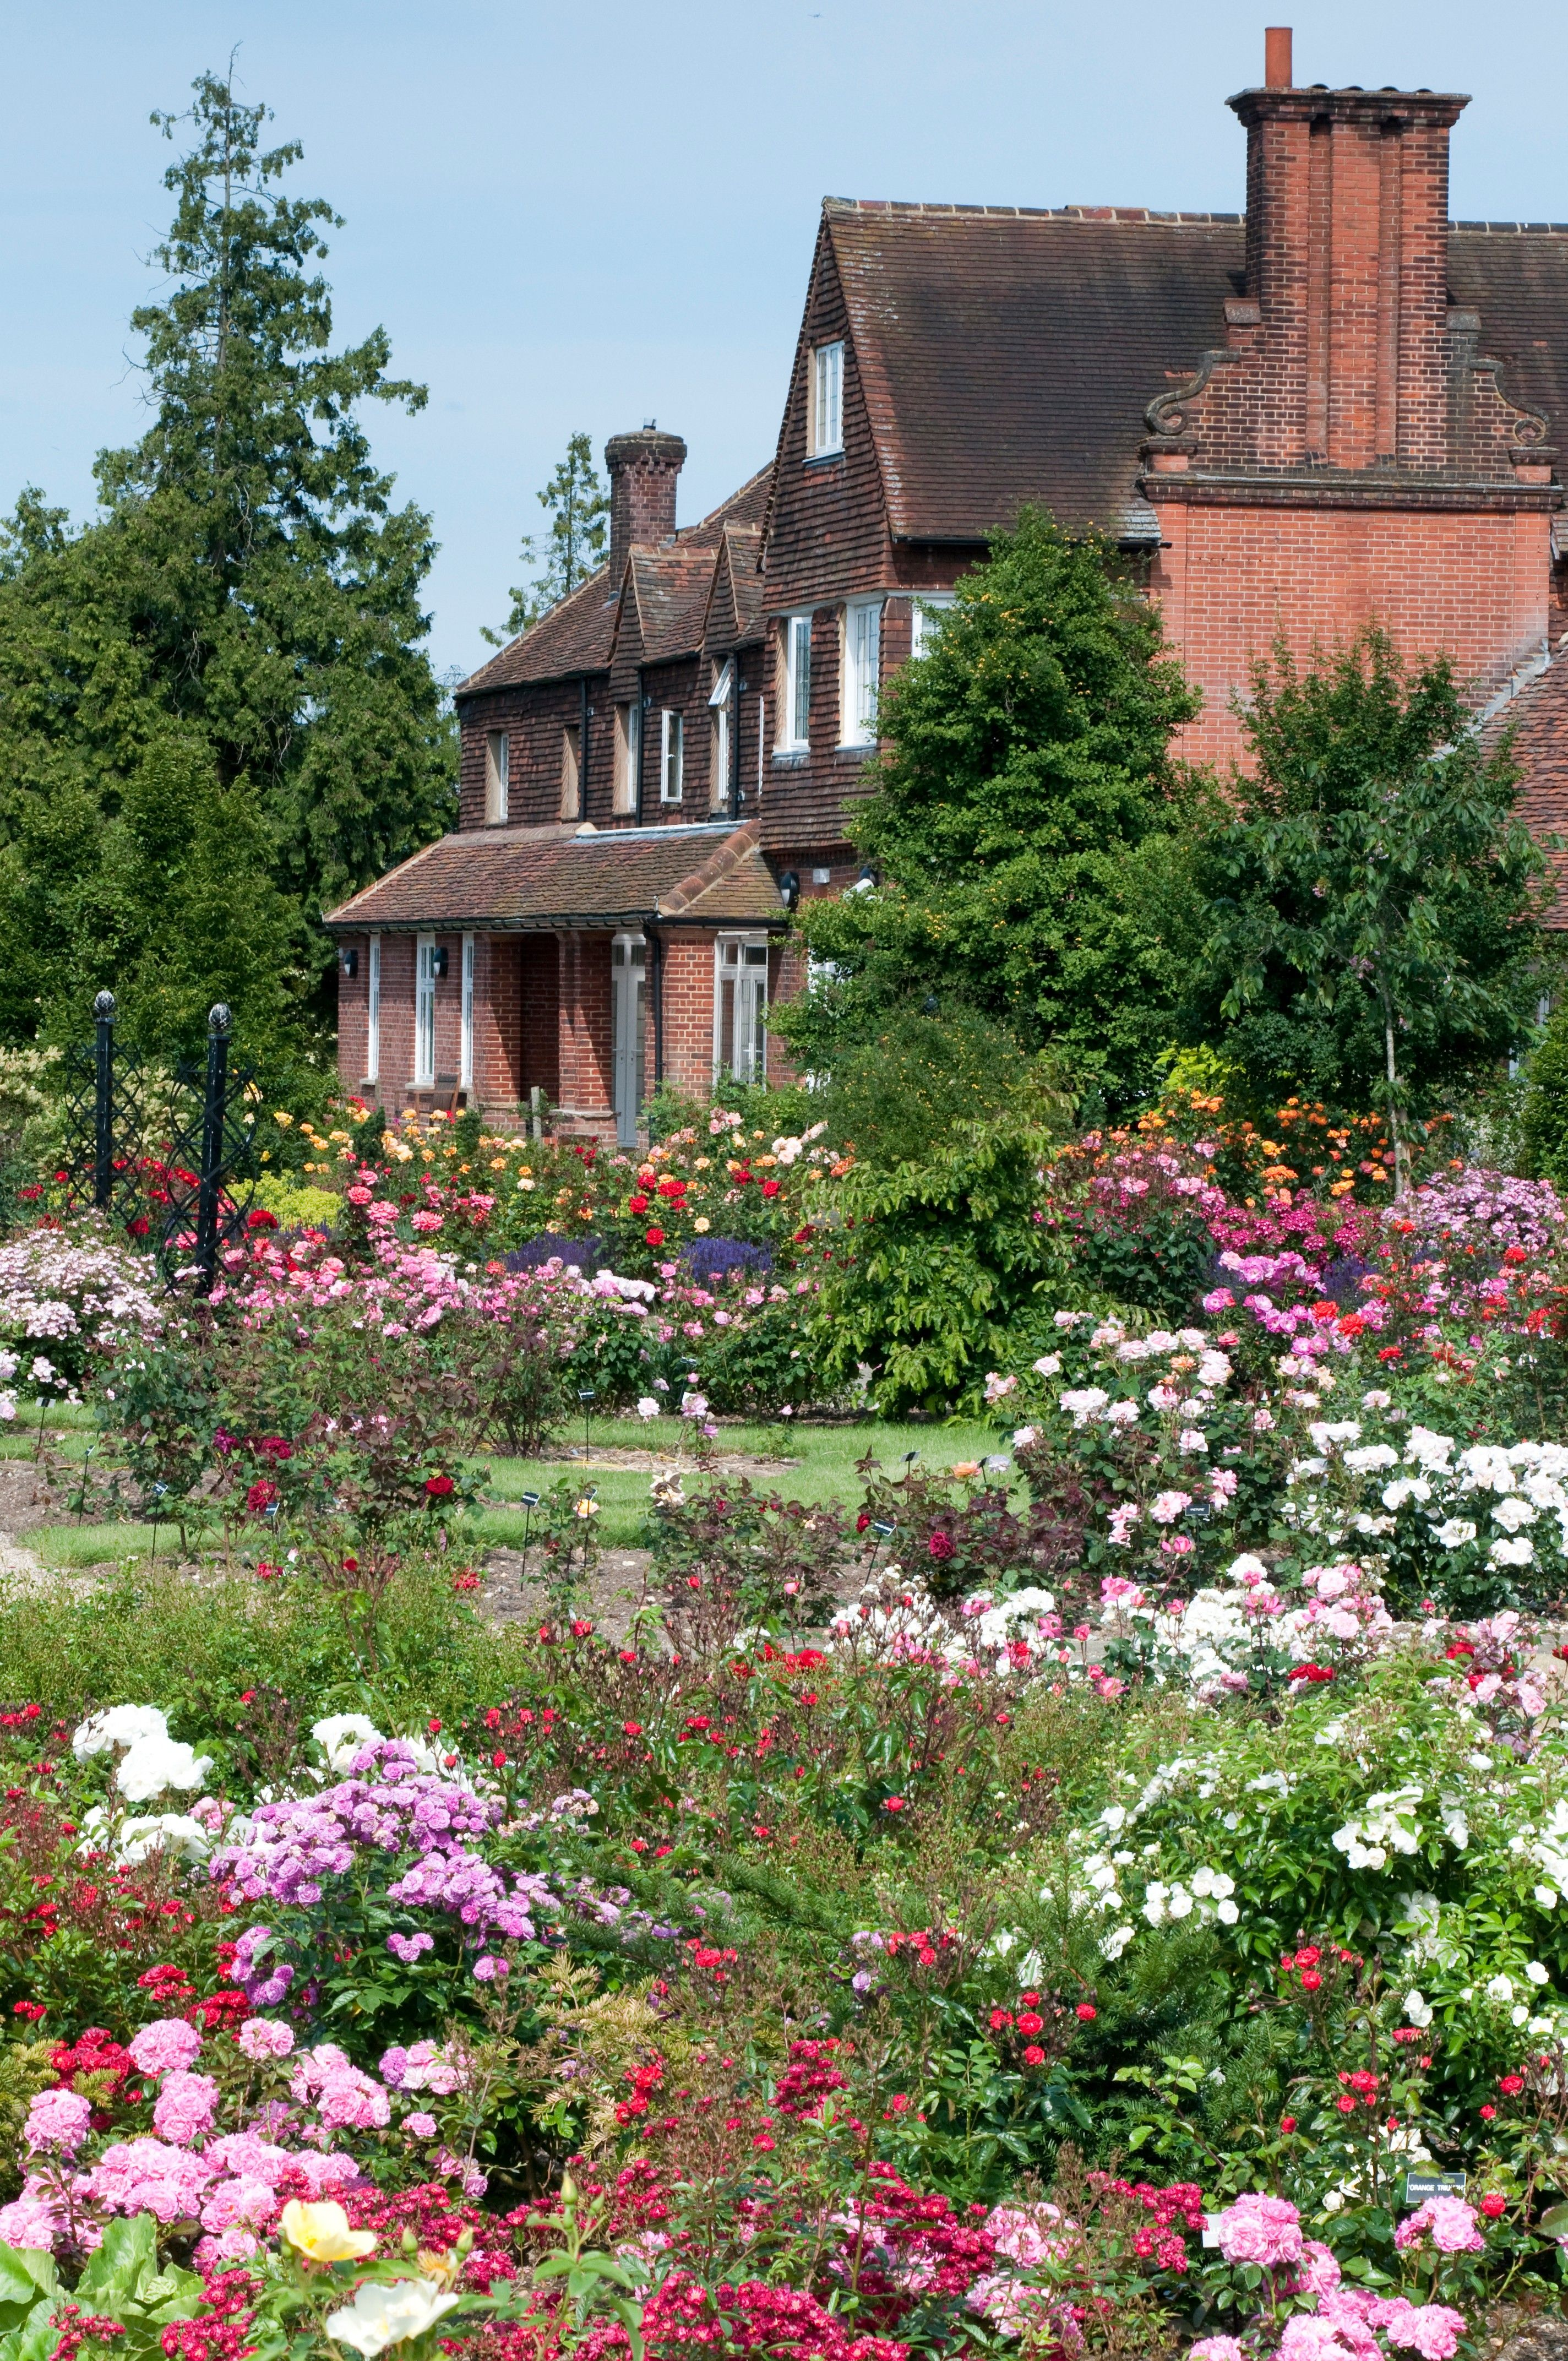 Gardens of the Rose Hertfordshire England Gardens Pinterest